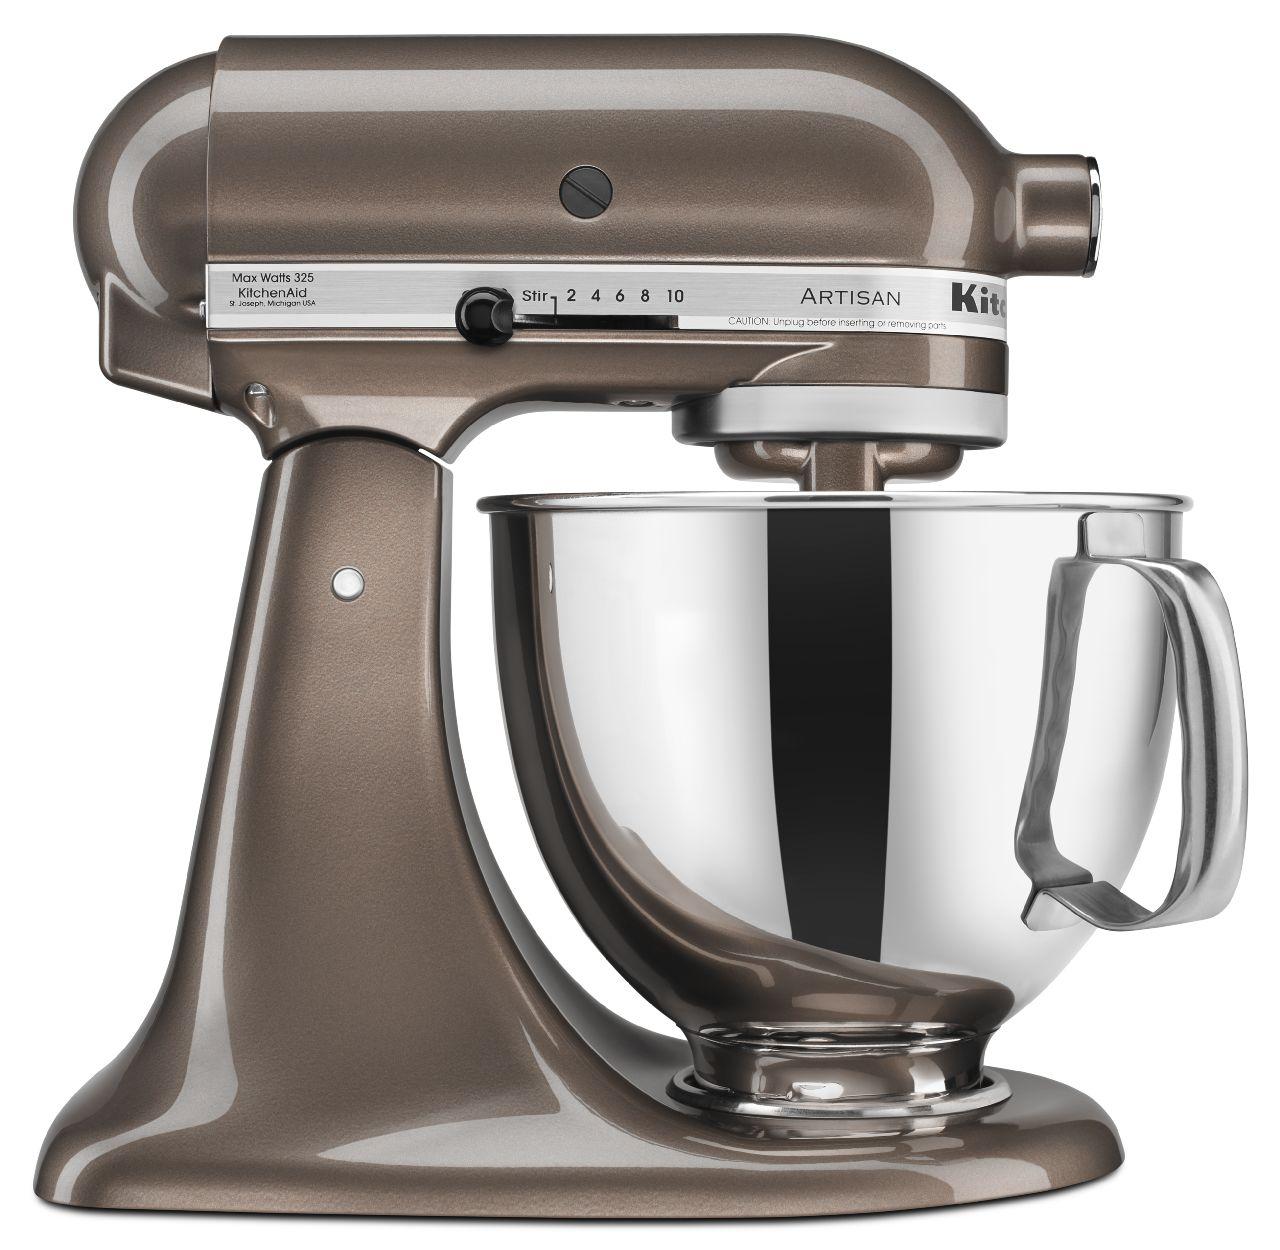 KitchenAid-Artisan-Series-5-Quart-Tilt-Head-Stand-Mixer-10-Speeds-KSM150PS thumbnail 13